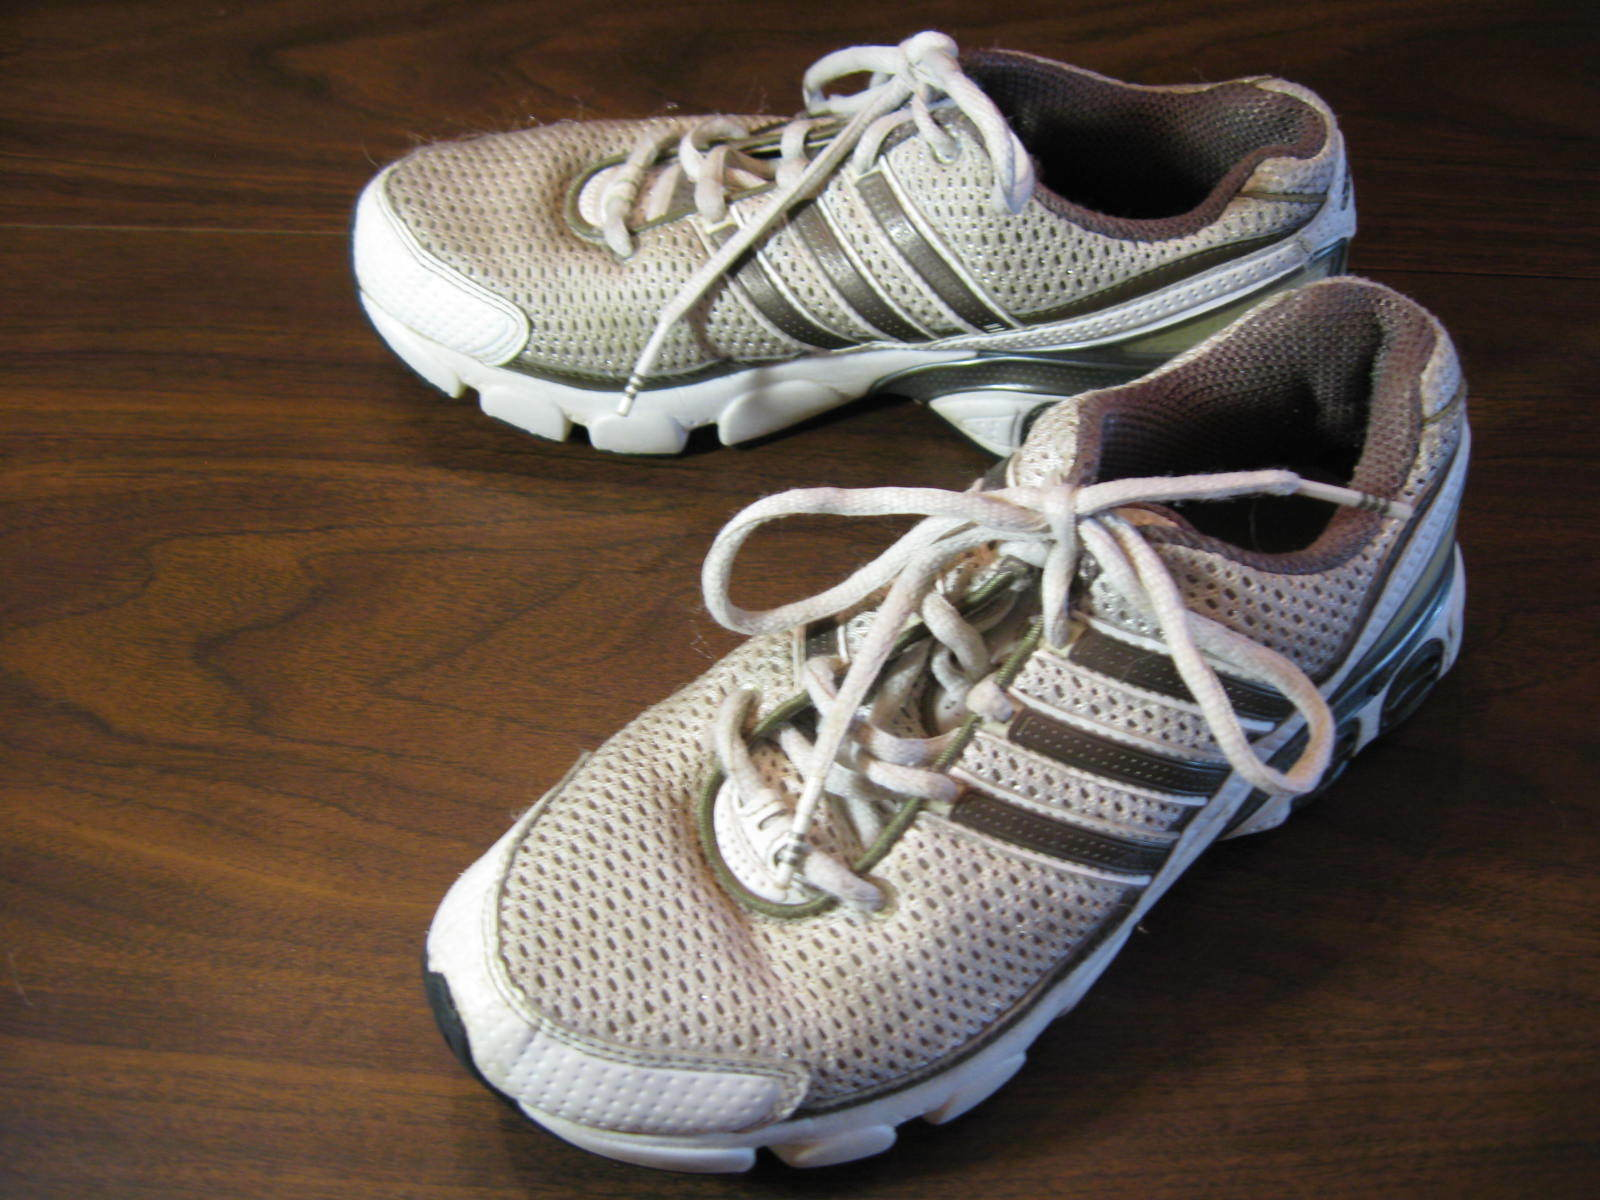 Adidas Adiprene Adiwear blanc argent Course Entraînehommest chaussures femmes